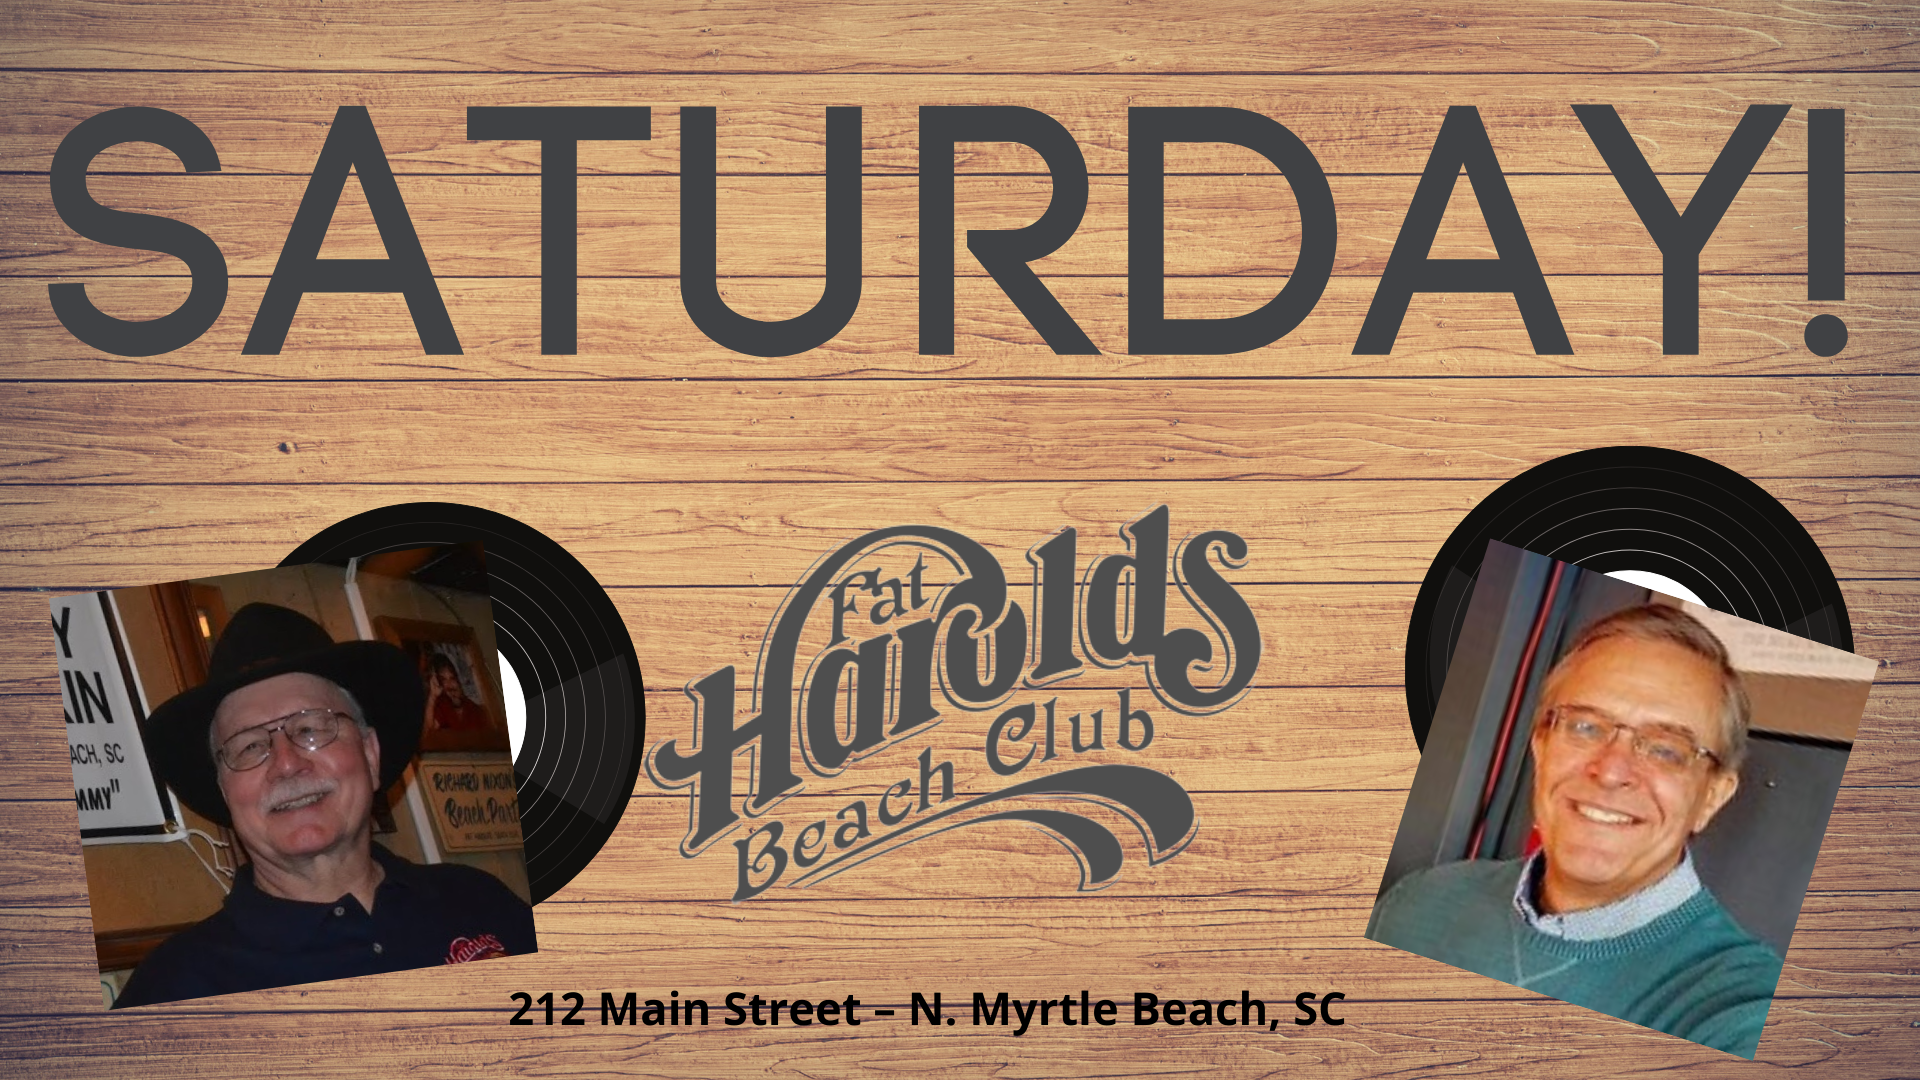 Saturday at Harolds!